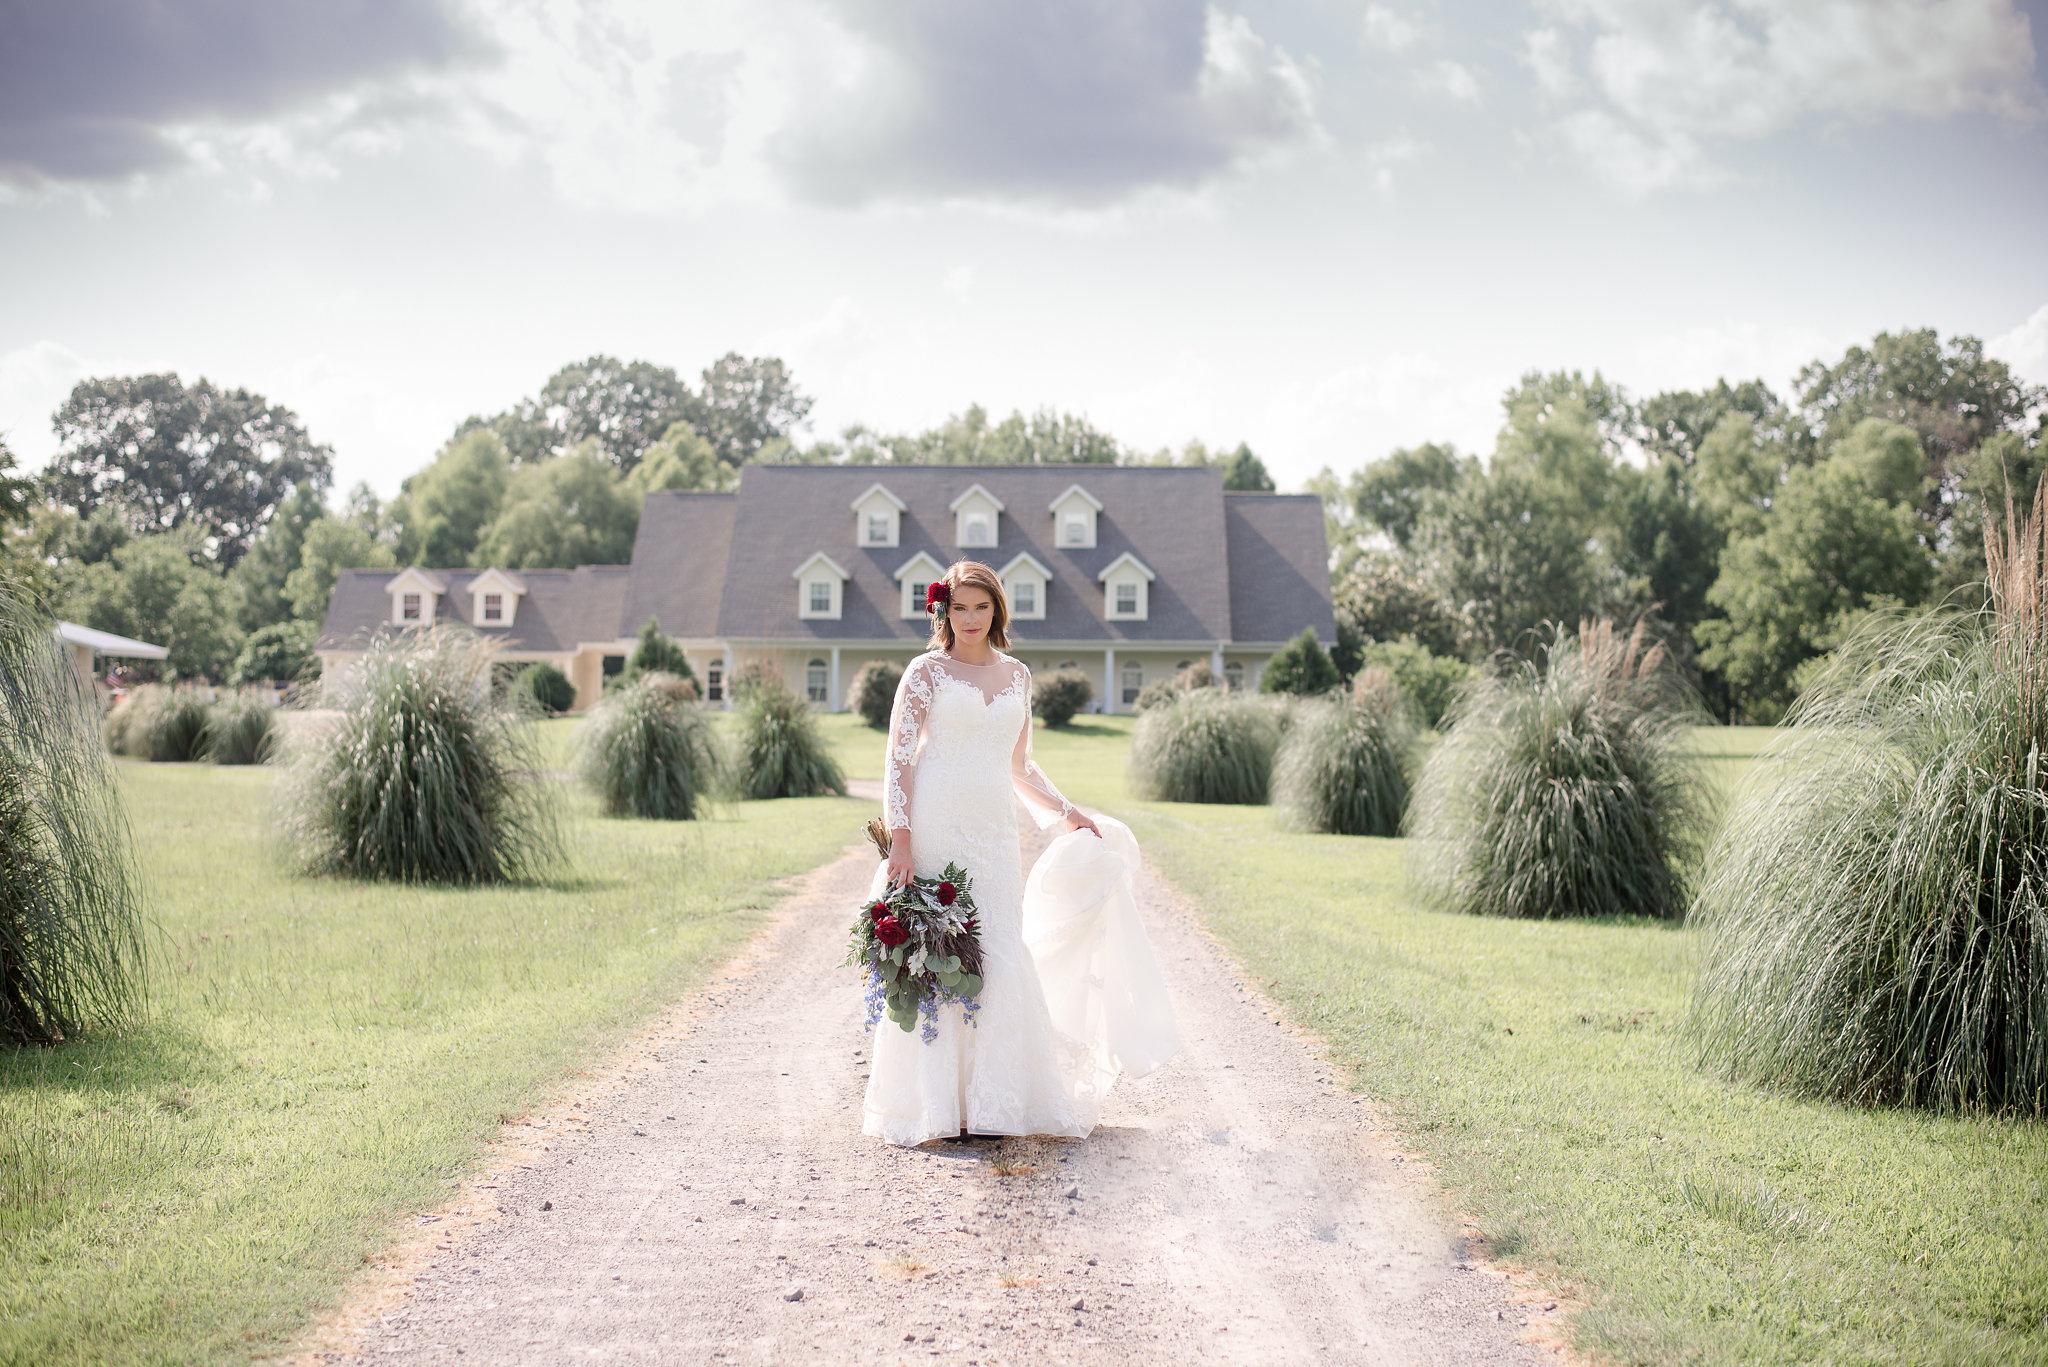 elizabeth-hayden-photography-wedding-arkansas-6276.jpg